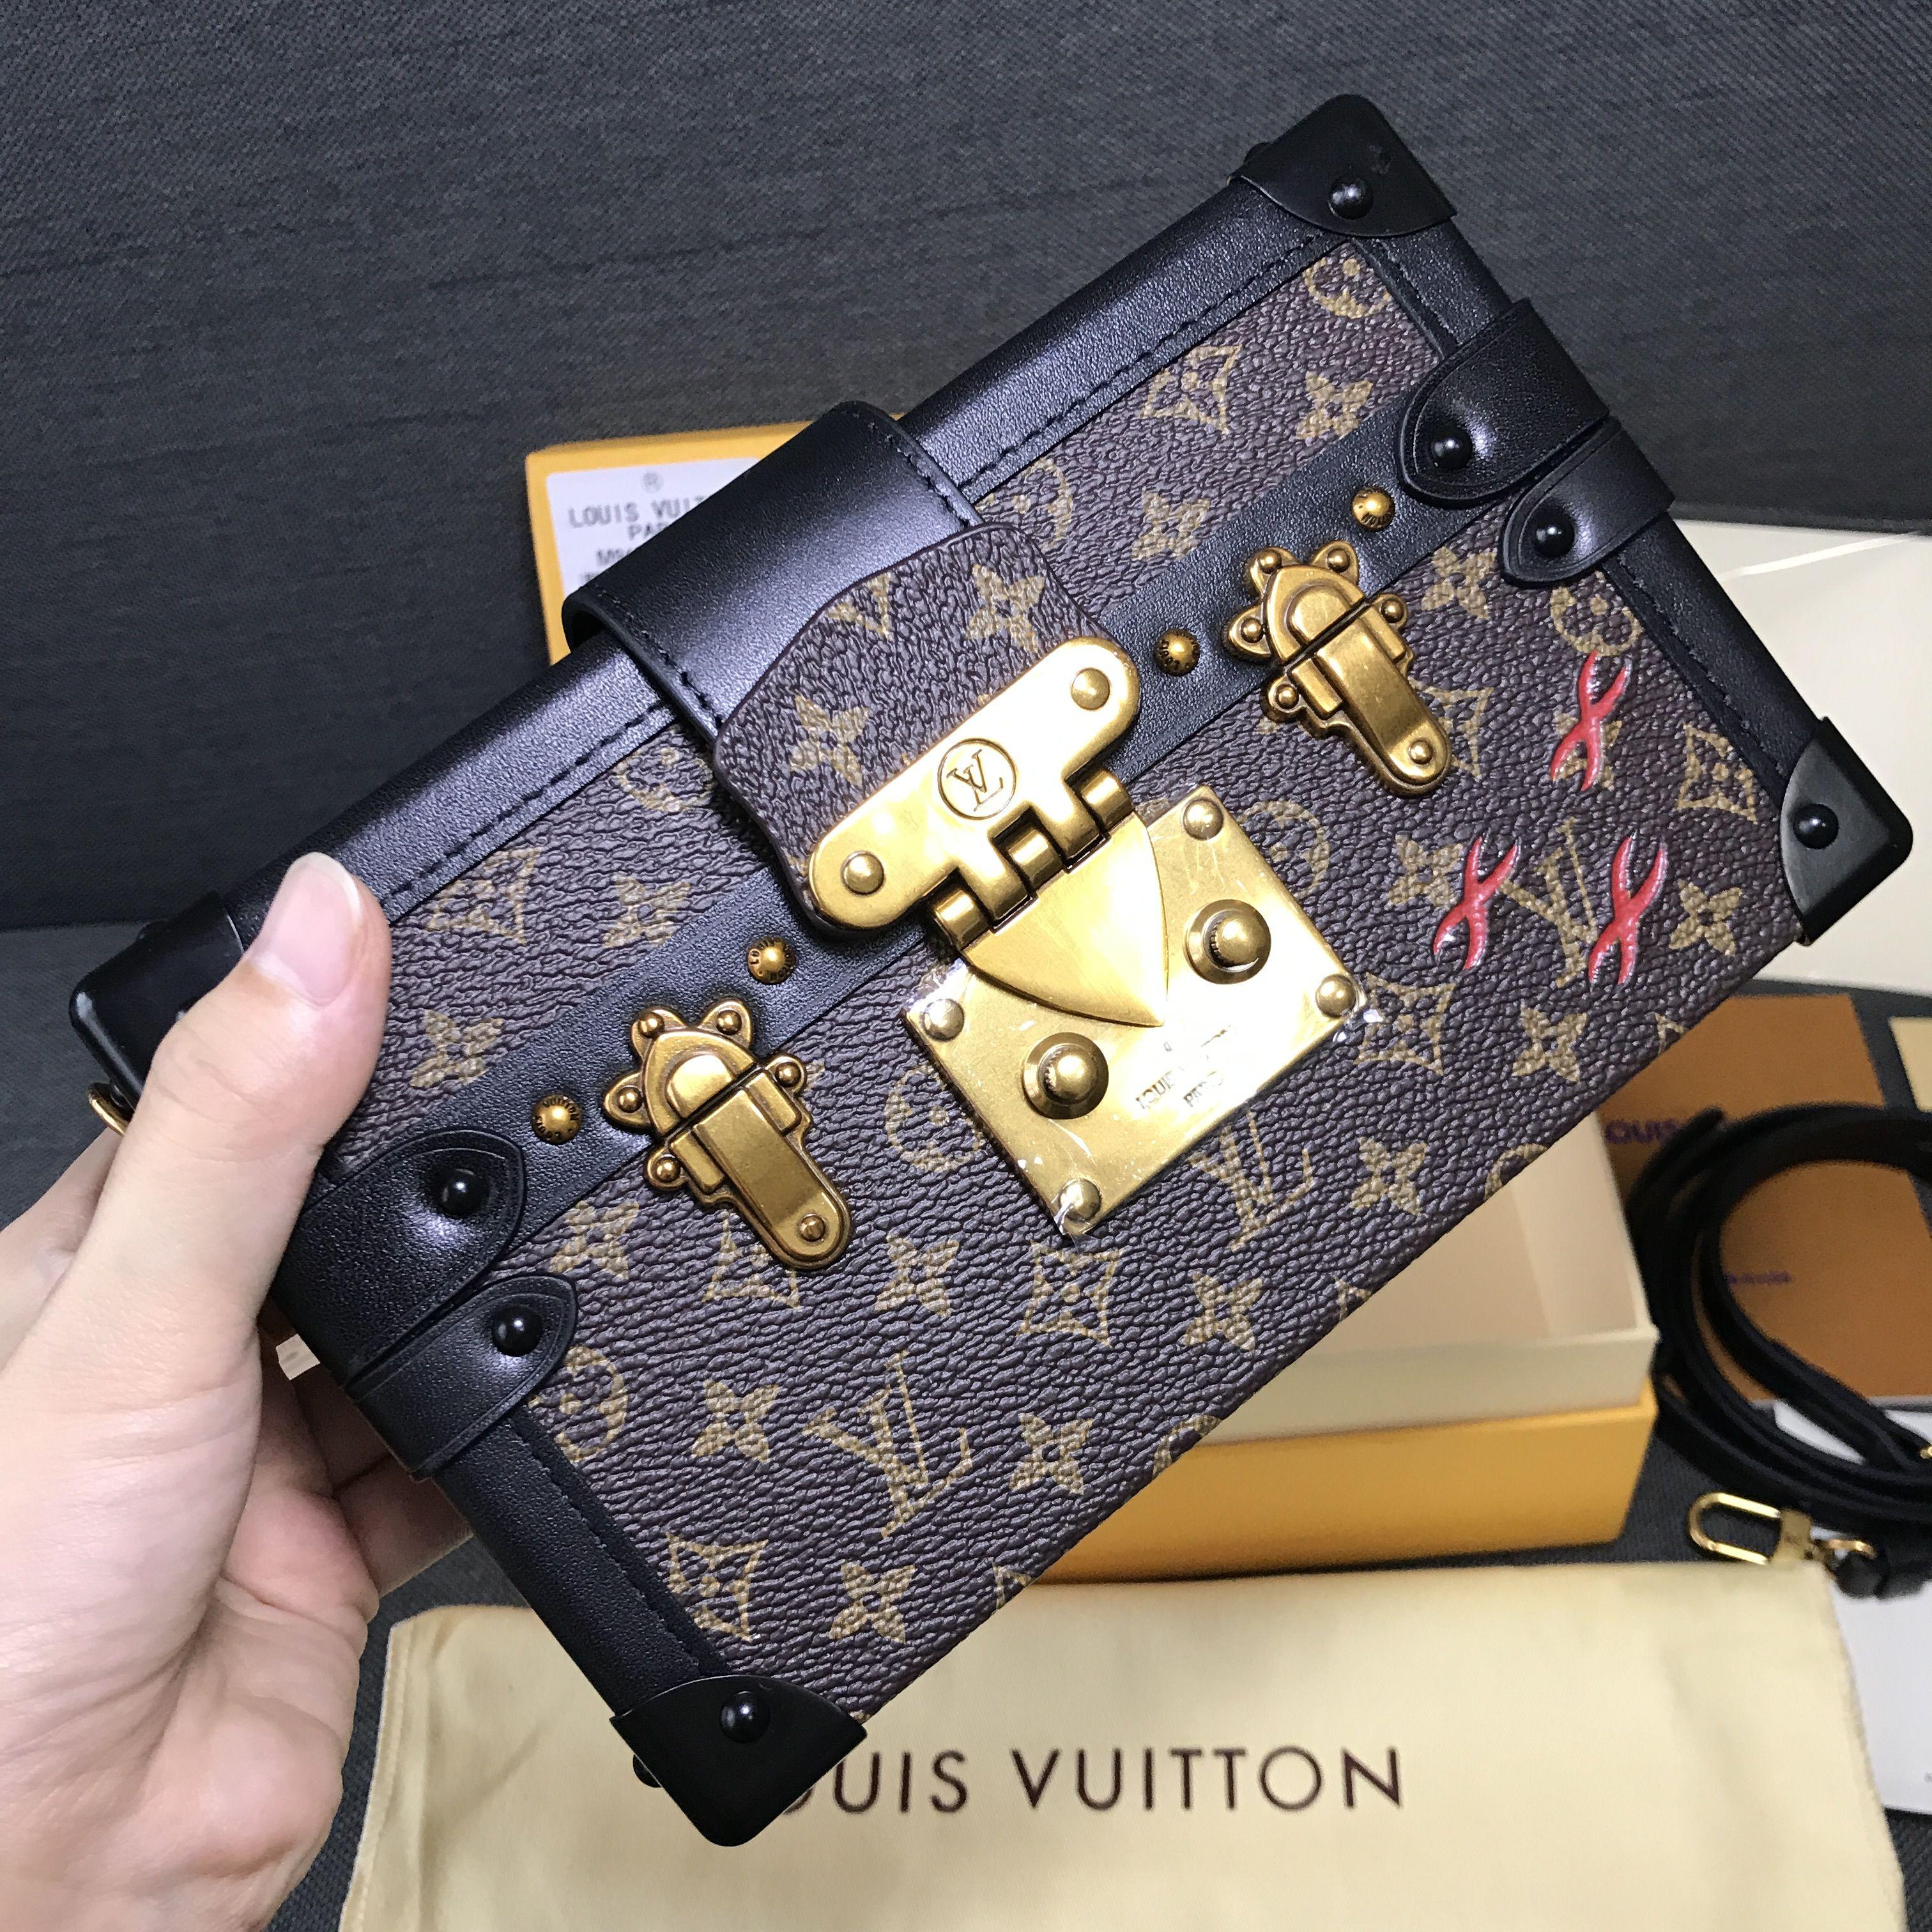 a21b06dcb3ebe Louis Vuitton lv clutch purse evening petite Malle bag monogram ...